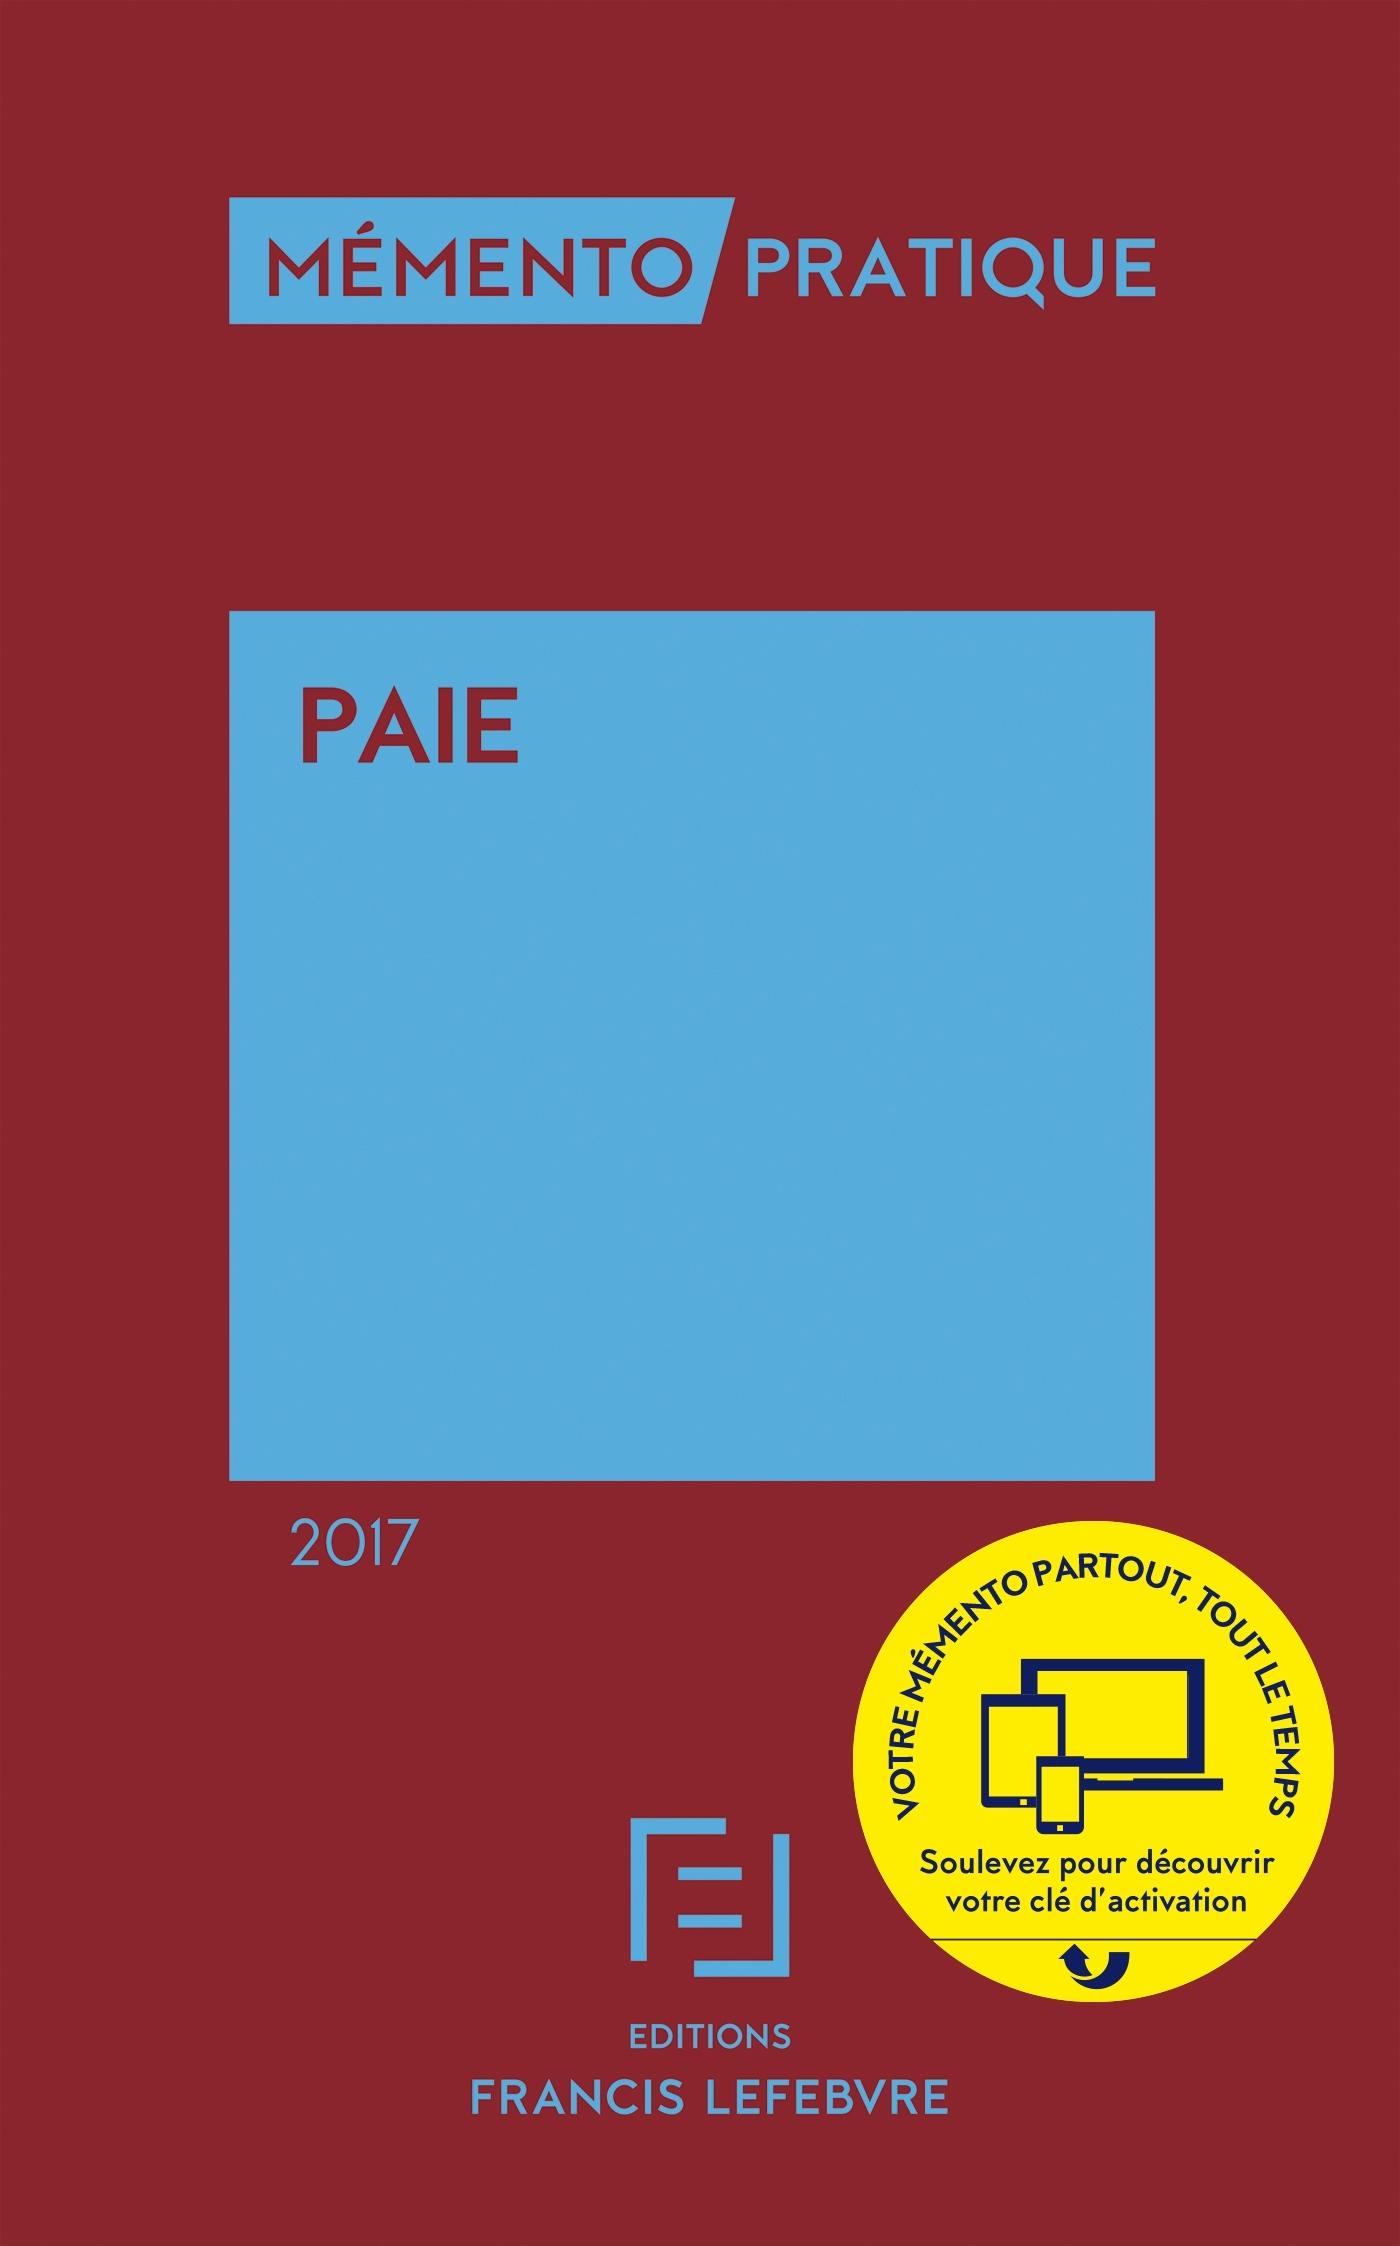 MEMENTO PAIE 2017